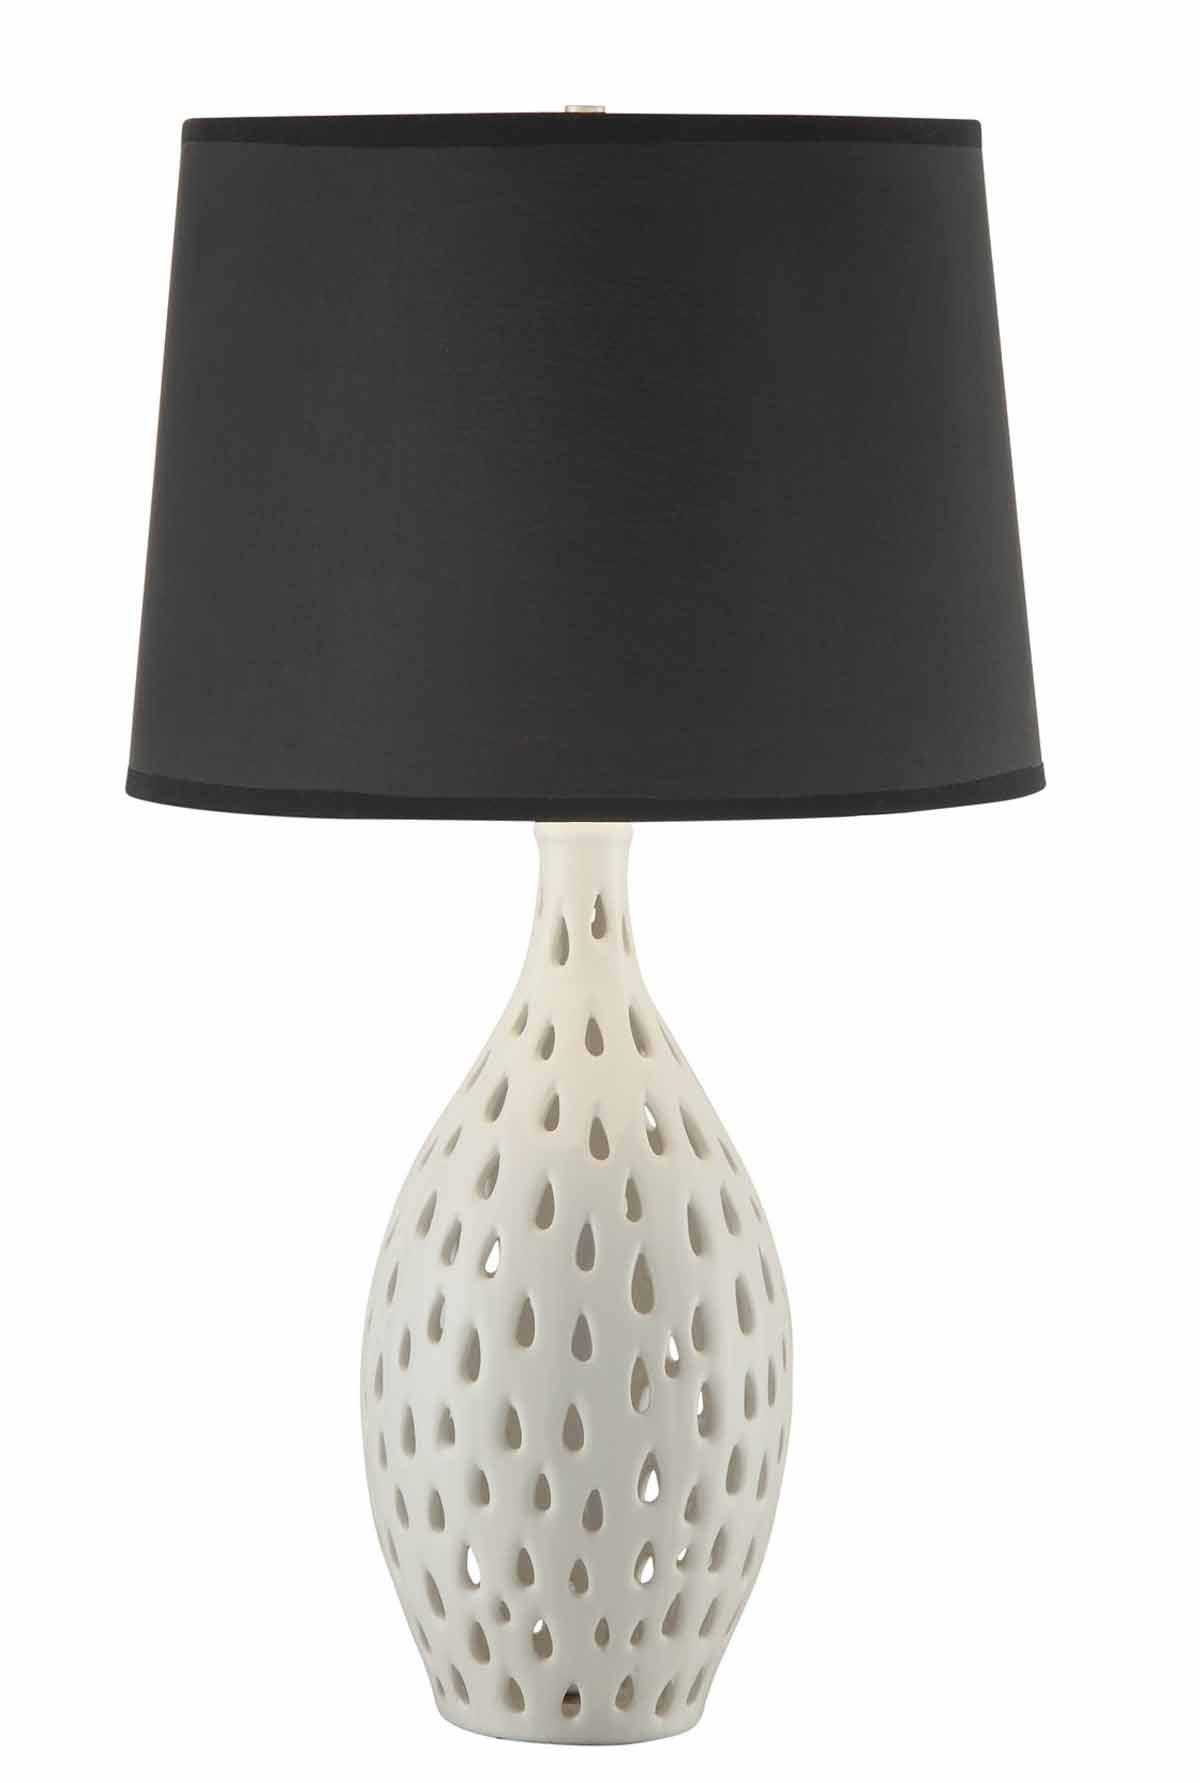 Coaster 901546 Table Lamp - White